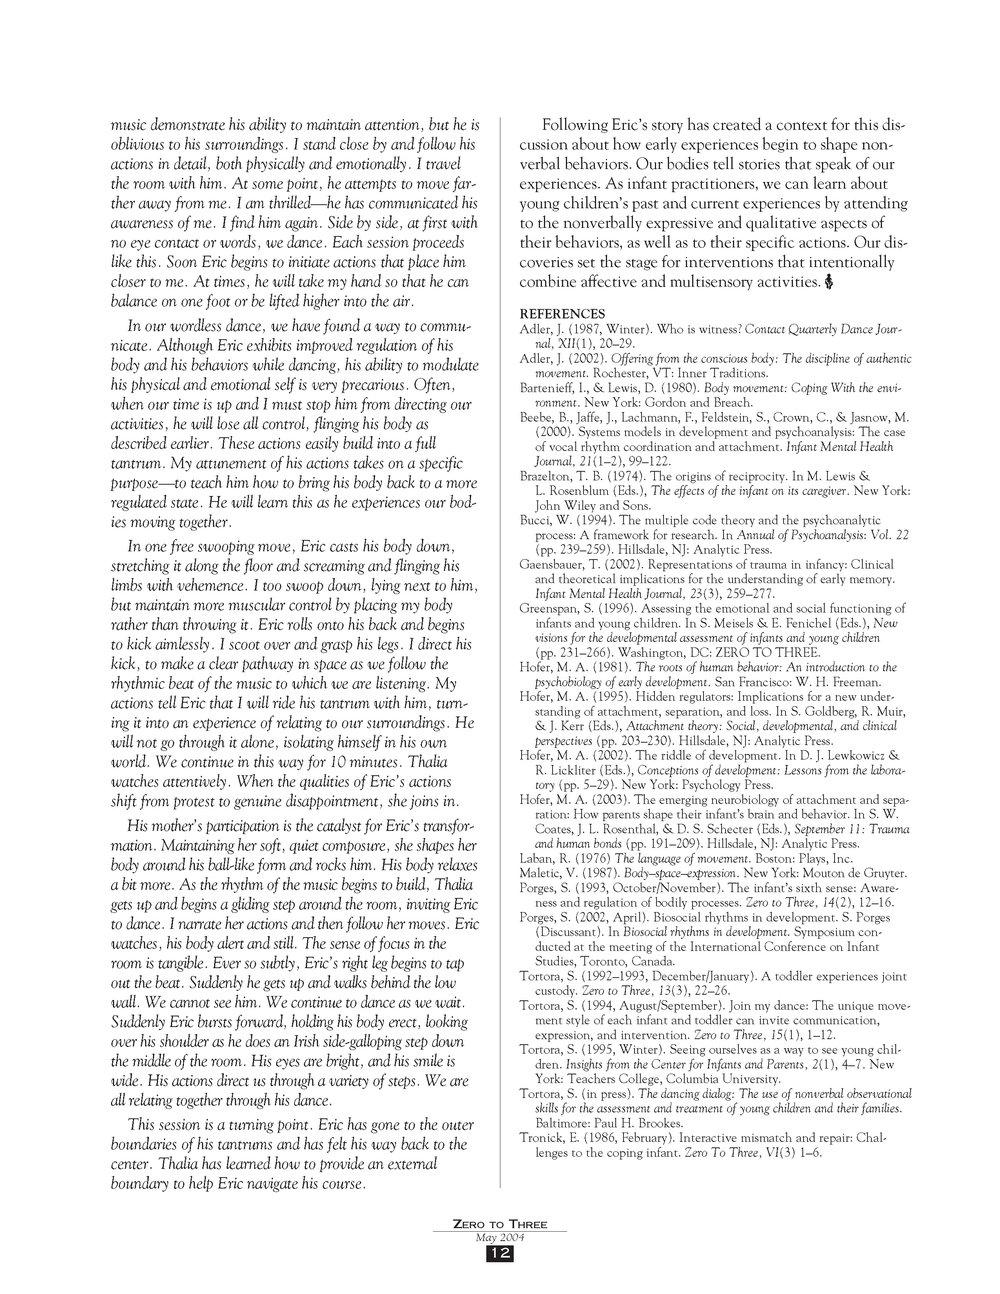 ZTT504.Tortora.OurMoving_Page_9.jpg